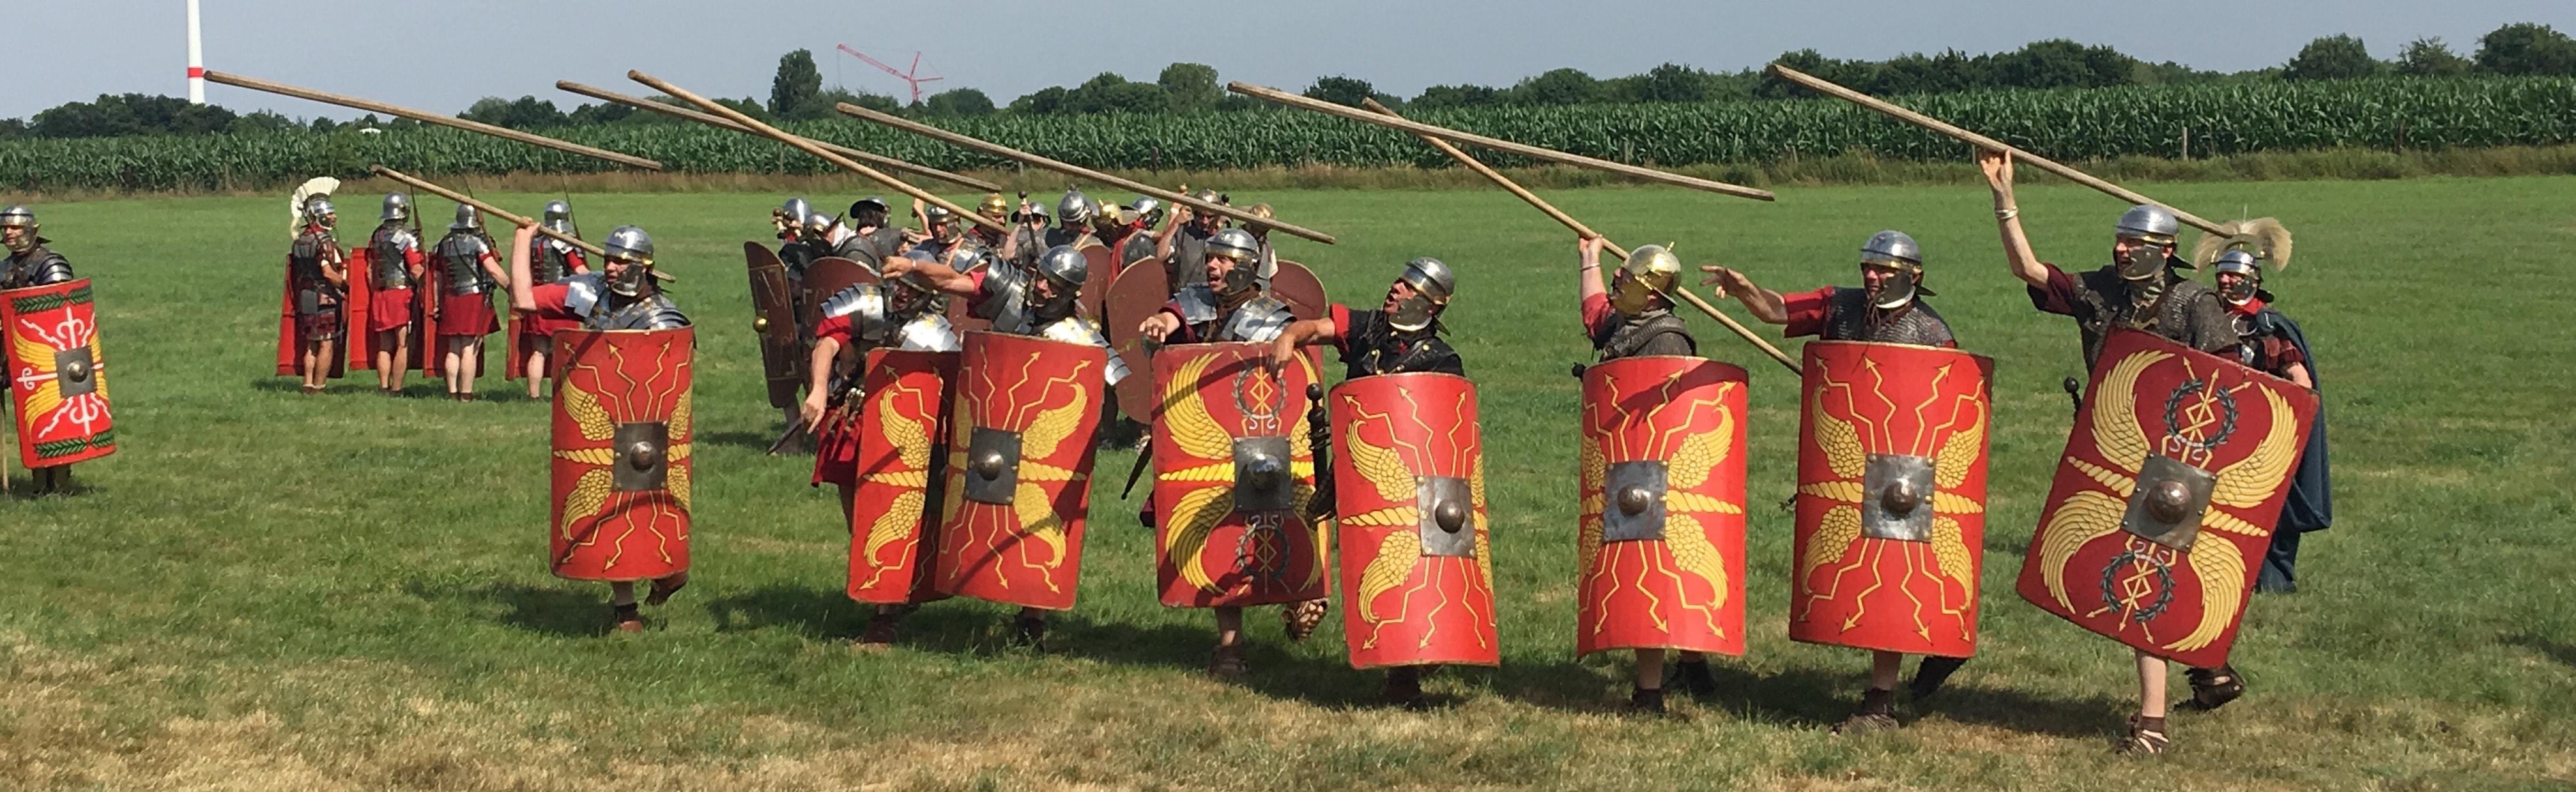 Romeinen gooien speren